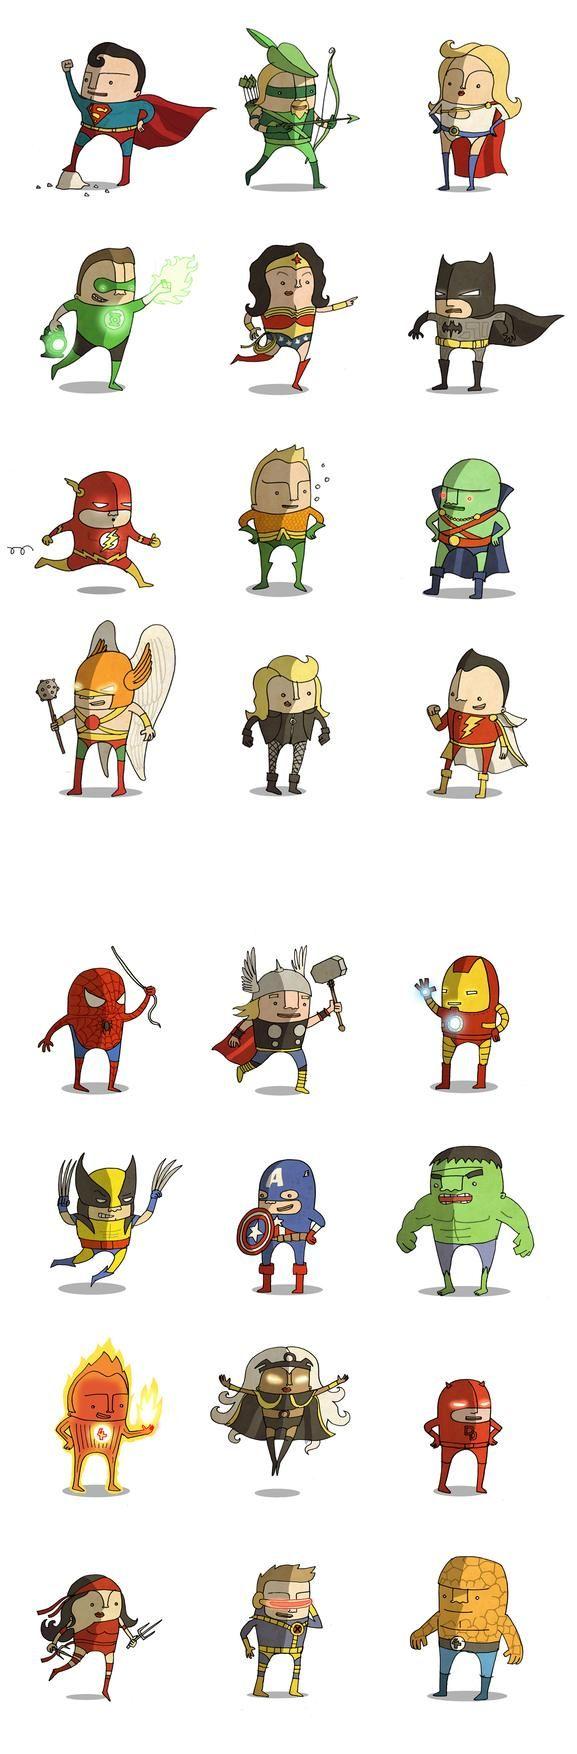 Graciosas mini caricaturas de superhéroes de Marvel y DC Comics (Adorable!)